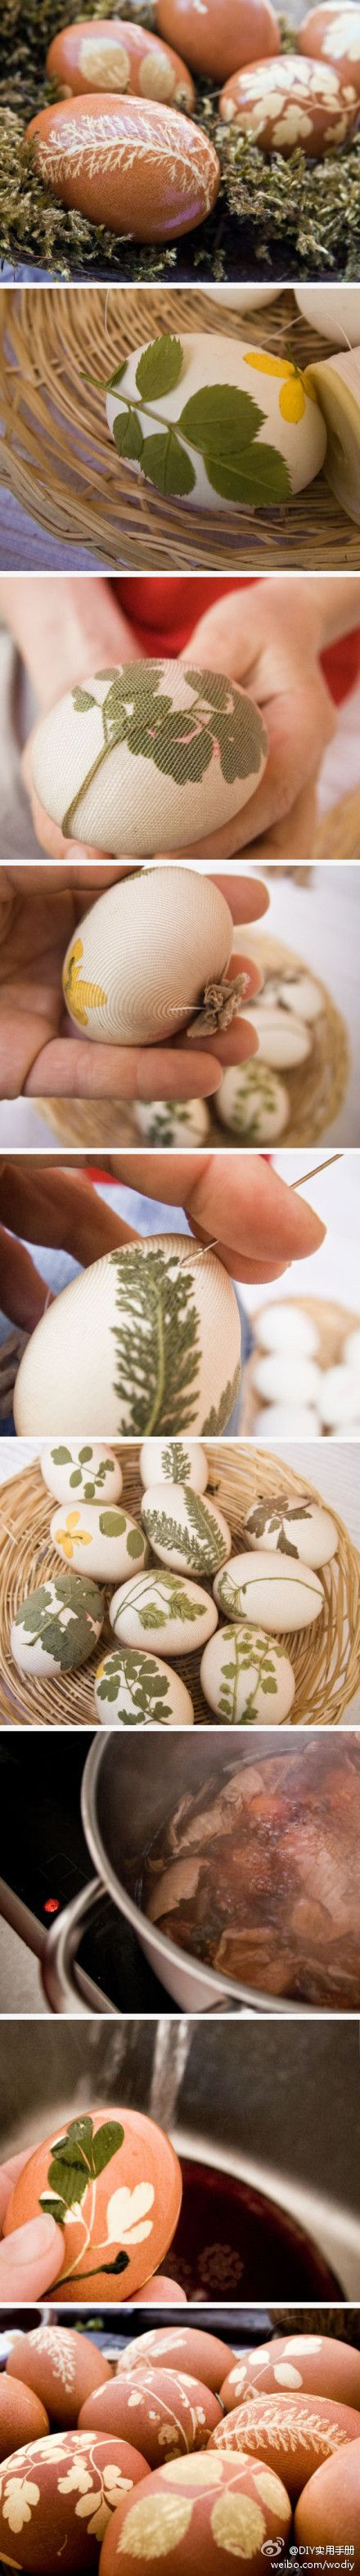 the prettiest eggs